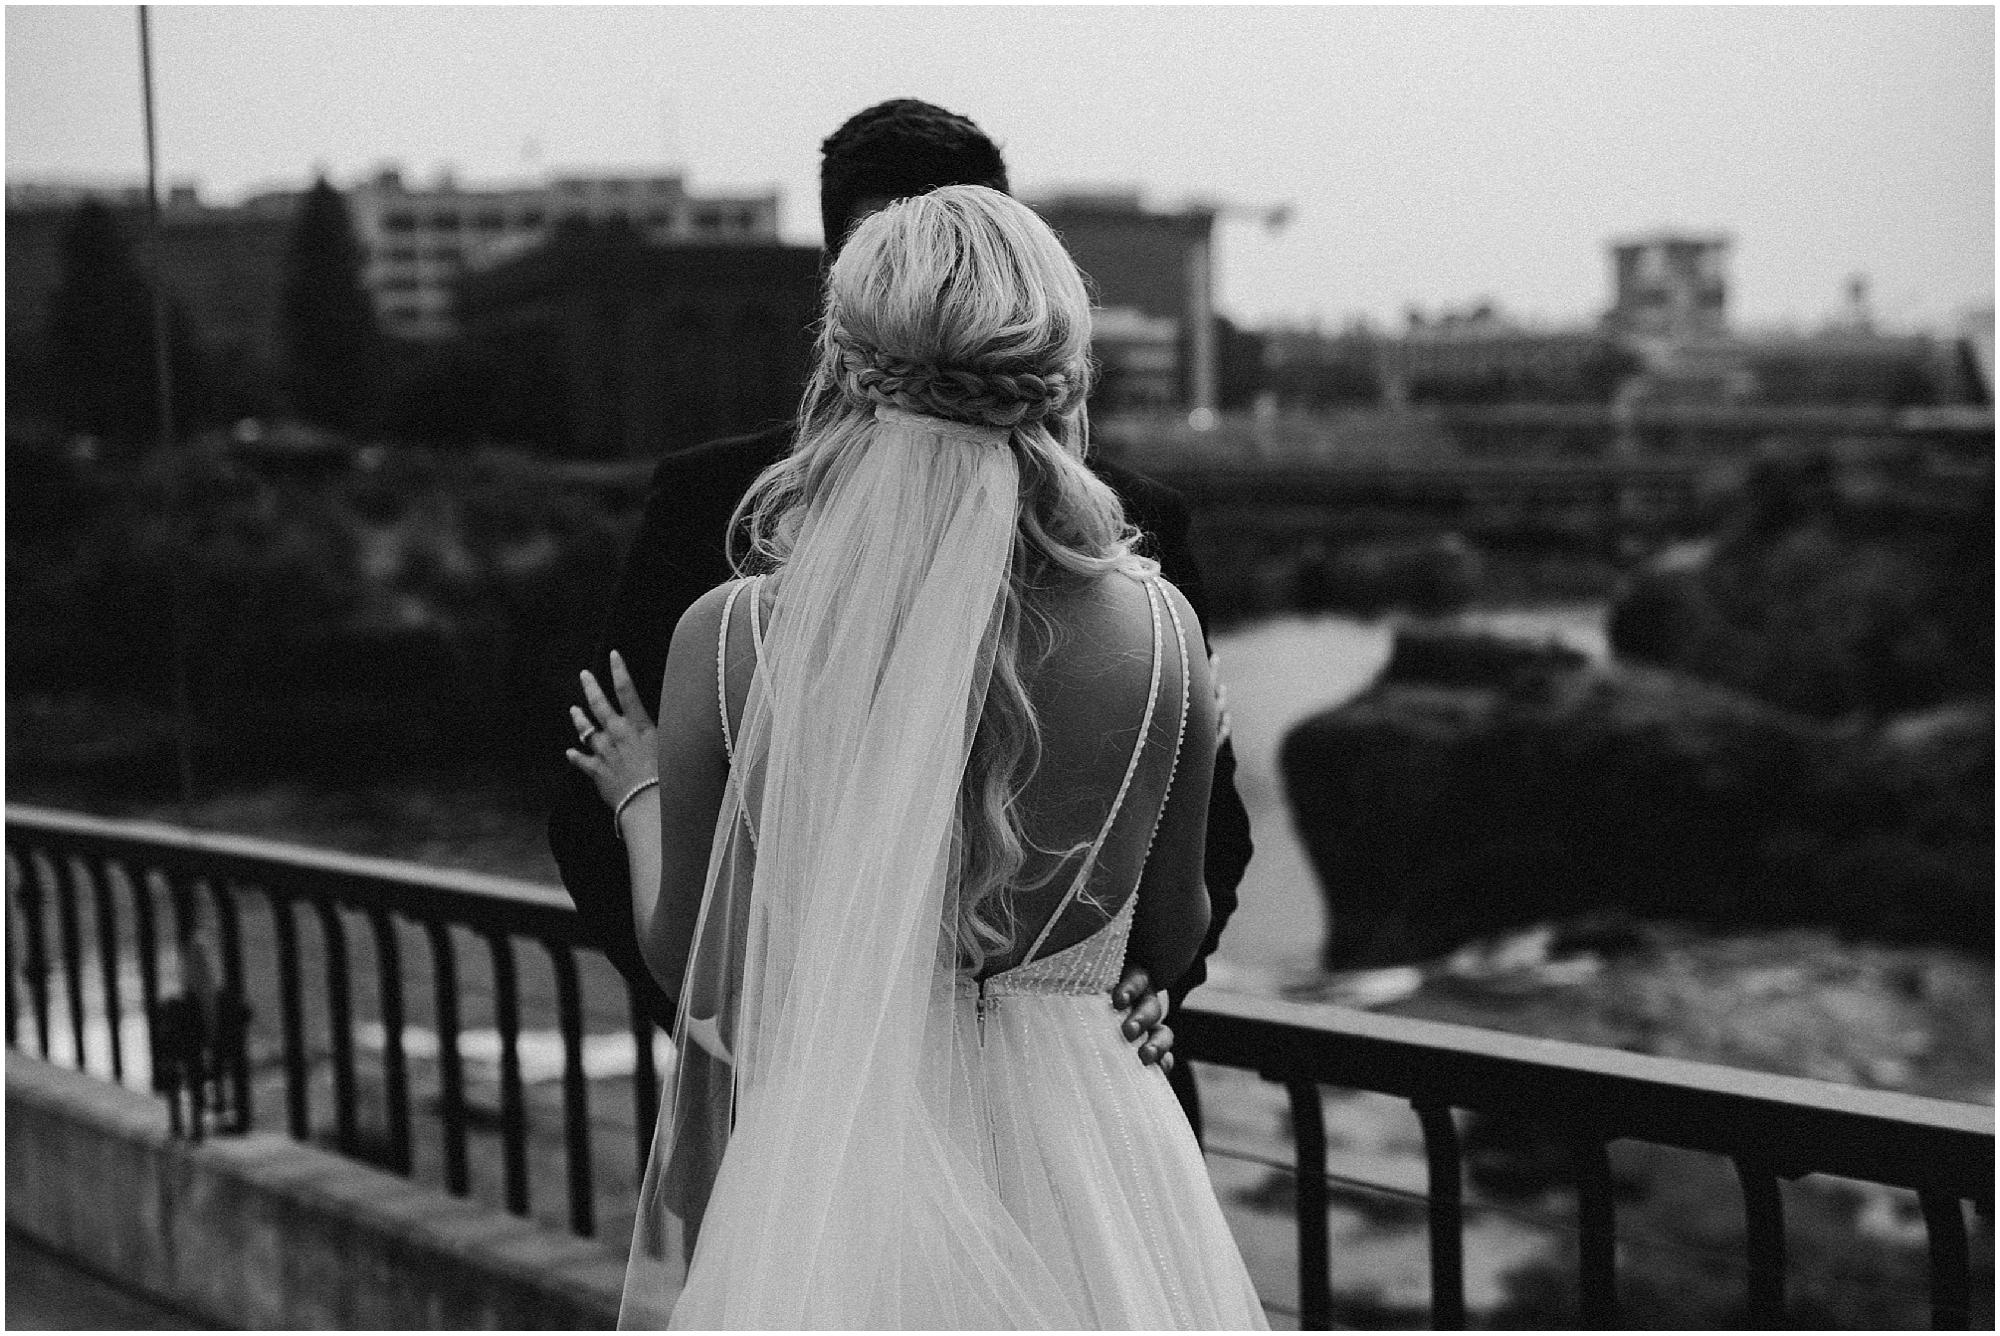 Chateau Rive Spokane Wedding Cassie Trottier Photography1025.jpg